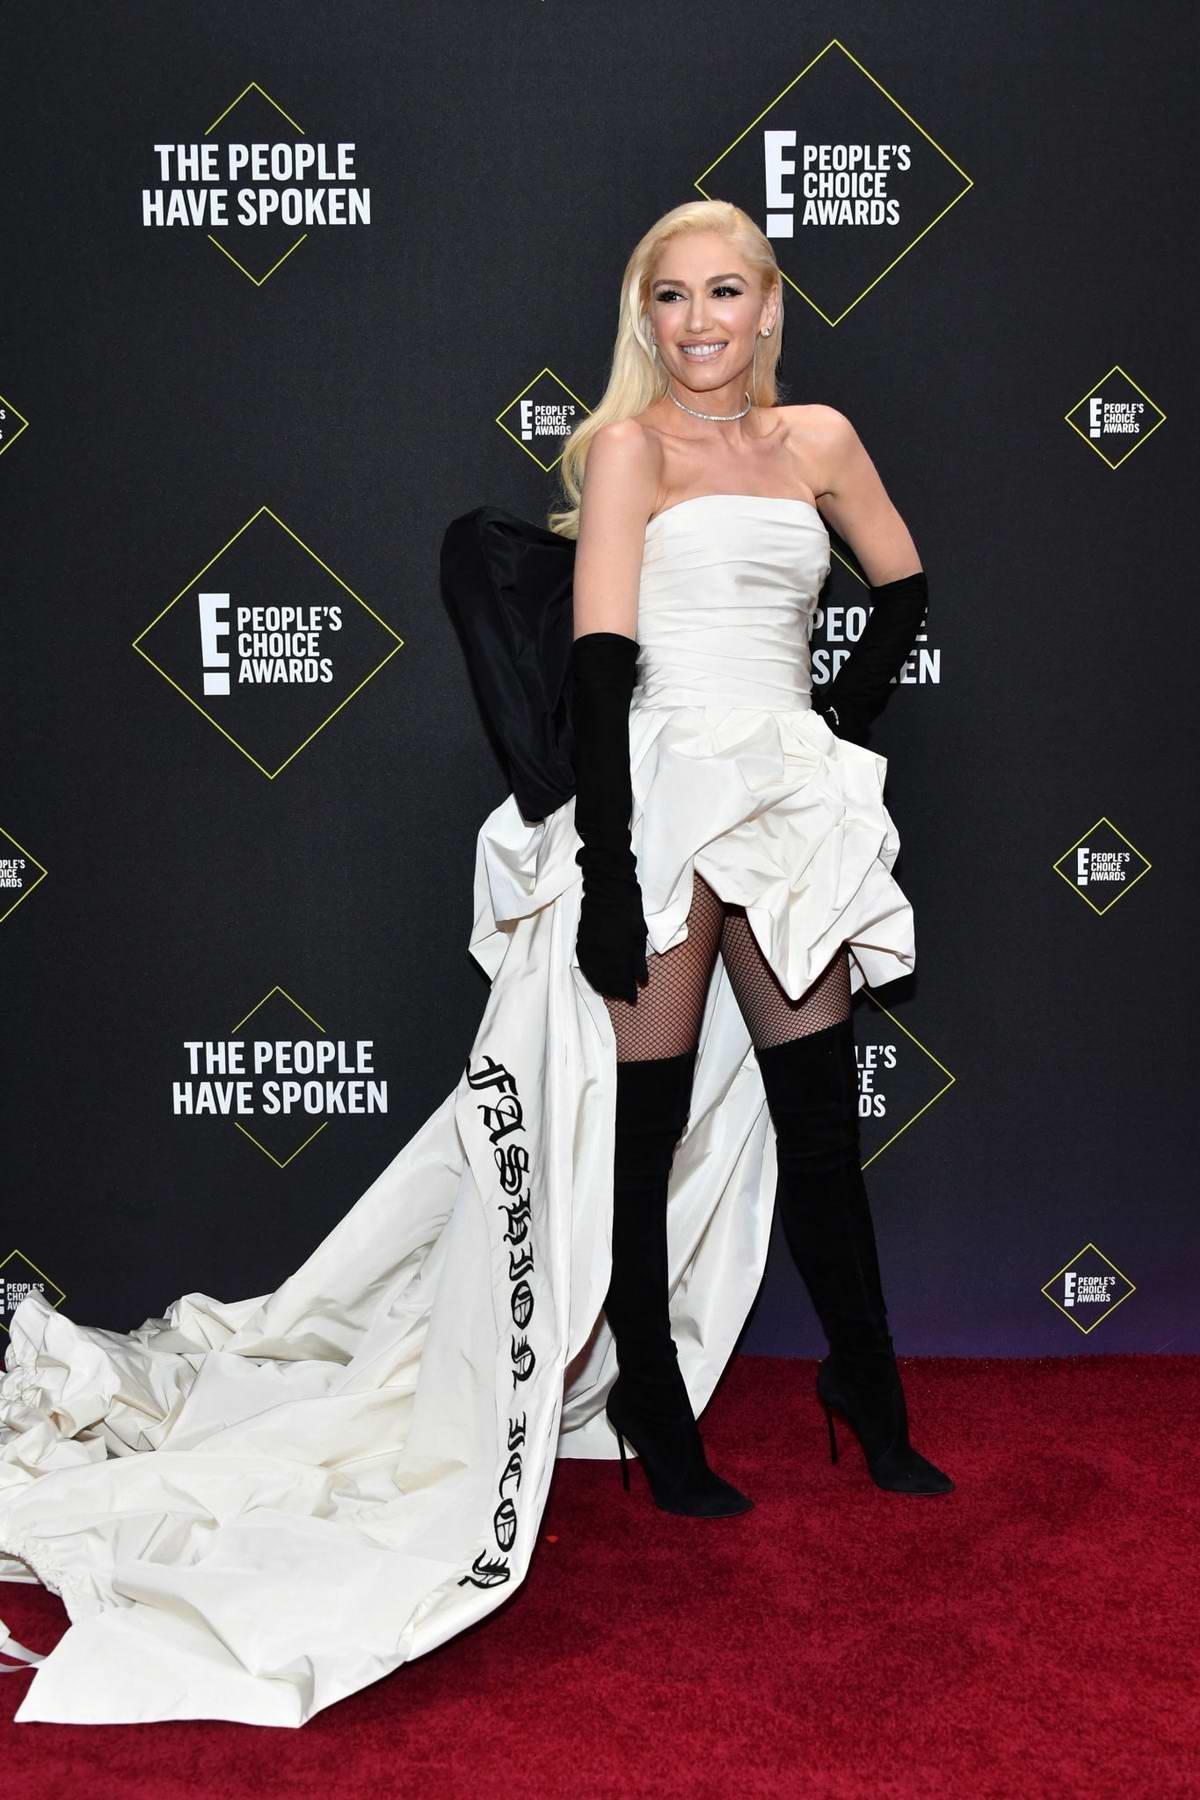 Gwen Stefani attends the 2019 E! People's Choice Awards held at the Barker Hangar in Santa Monica, California